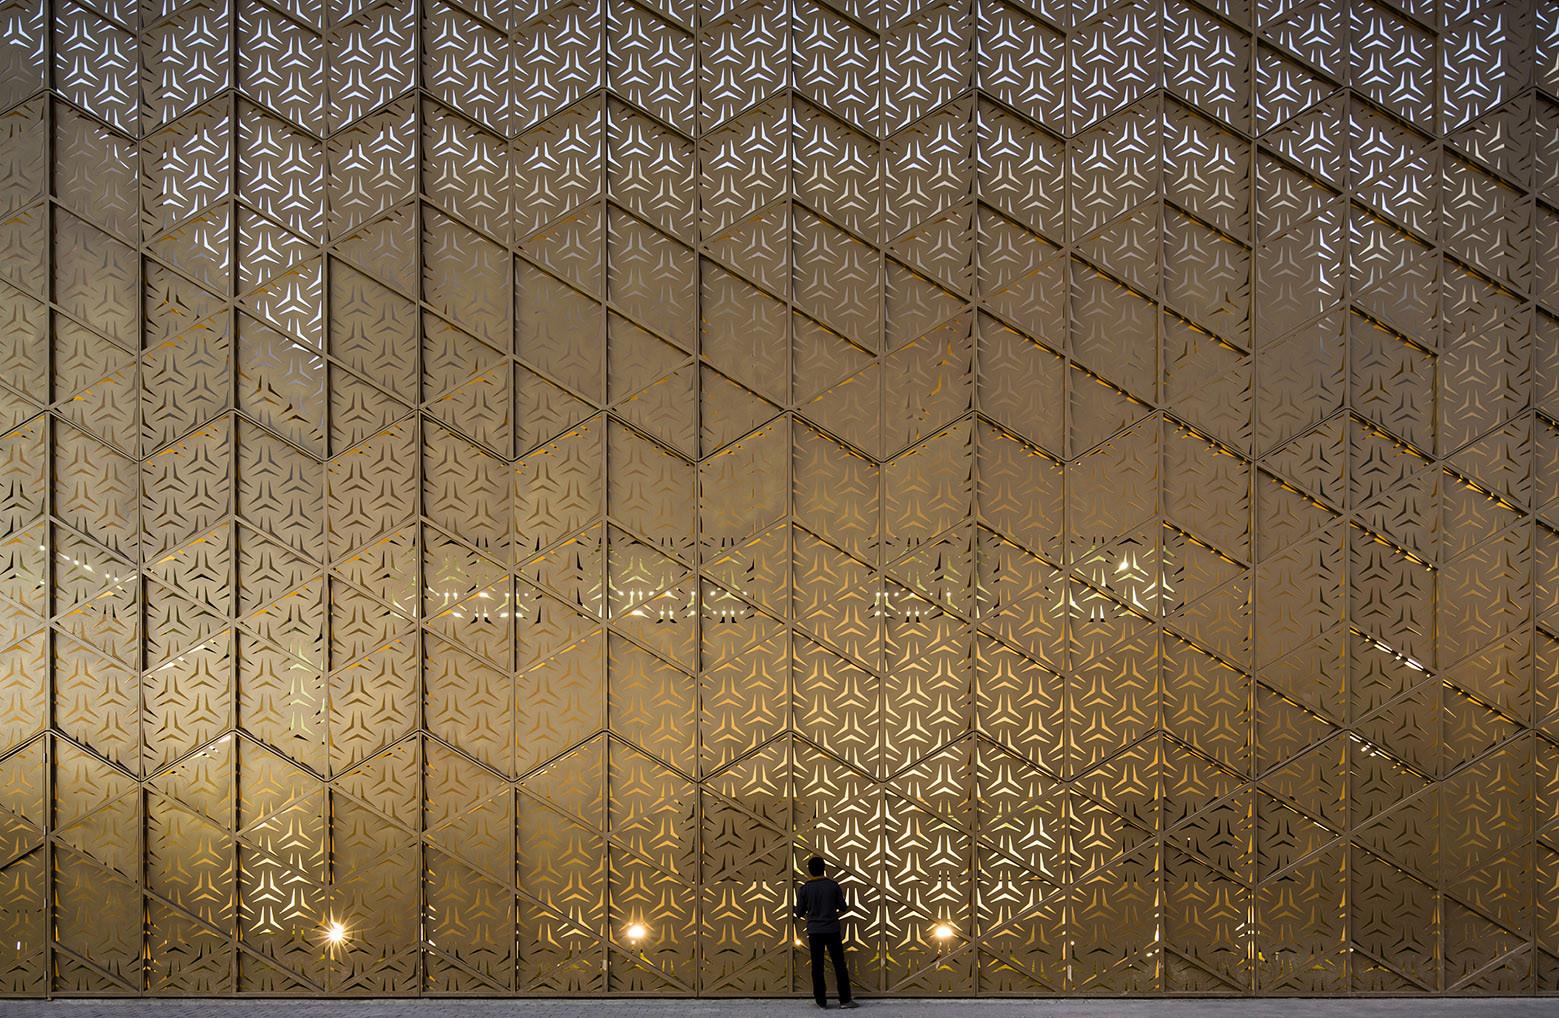 Clínica Ali Mohammed T. Al-Ghanim / AGi architects, © Nelson Garrido